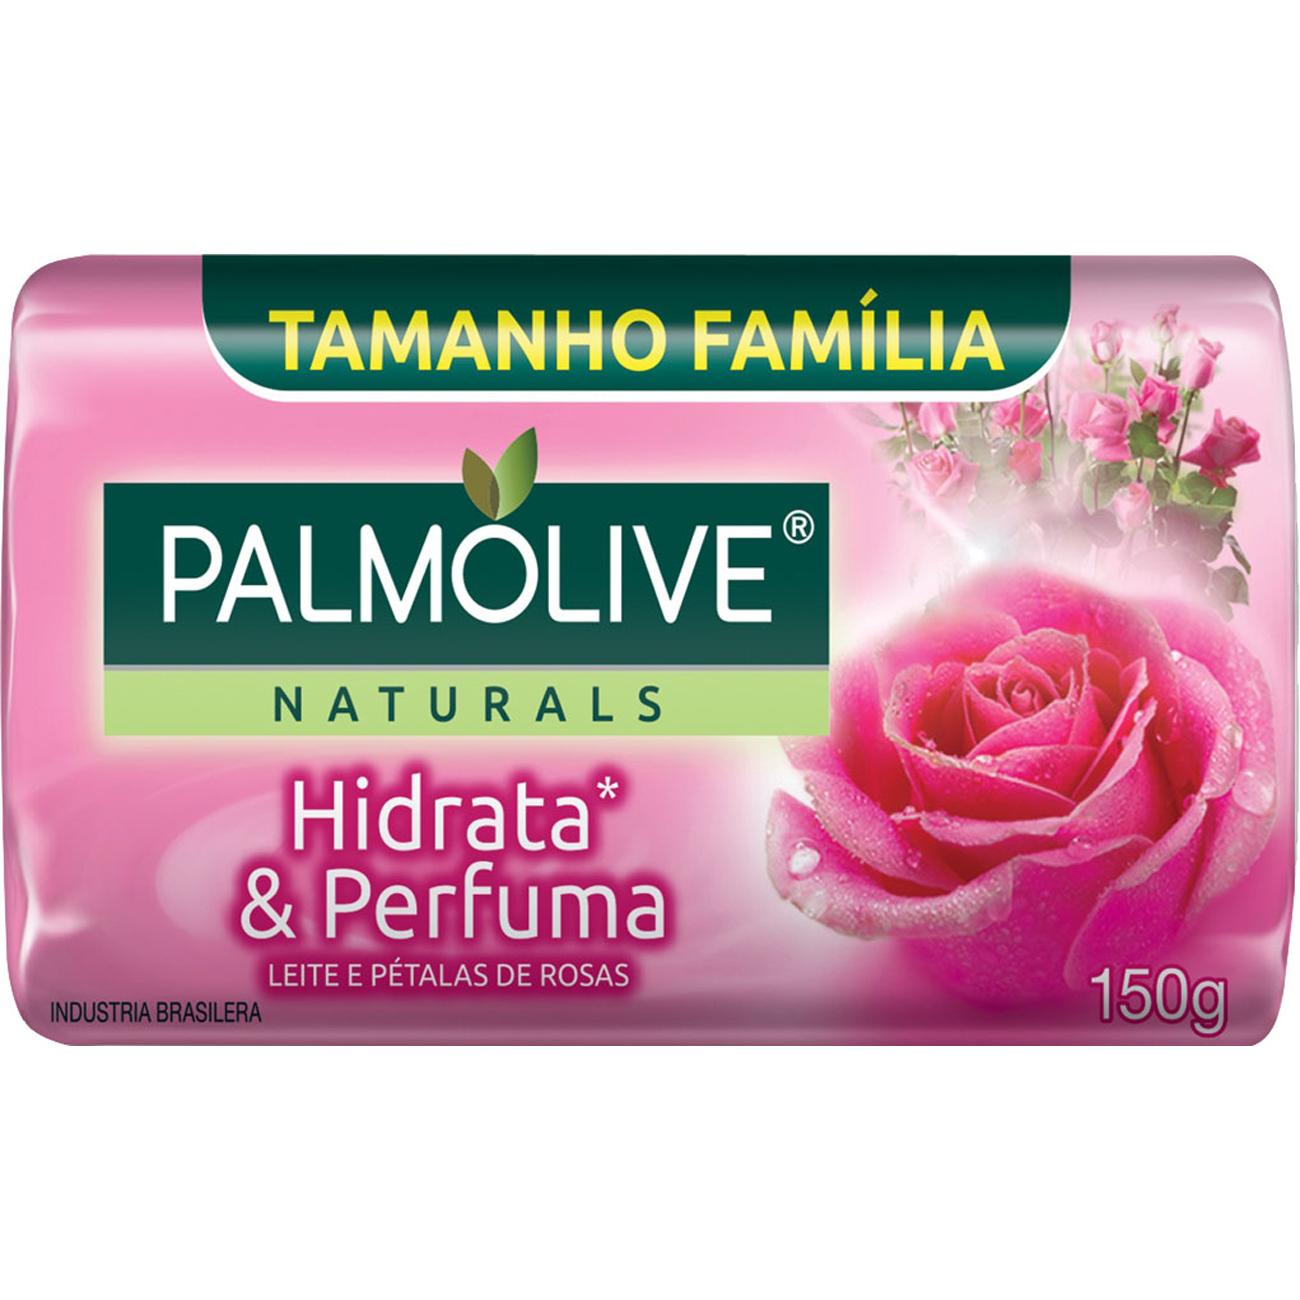 Sabonete em Barra Palmolive Naturals Hidrata E Perfuma 150G